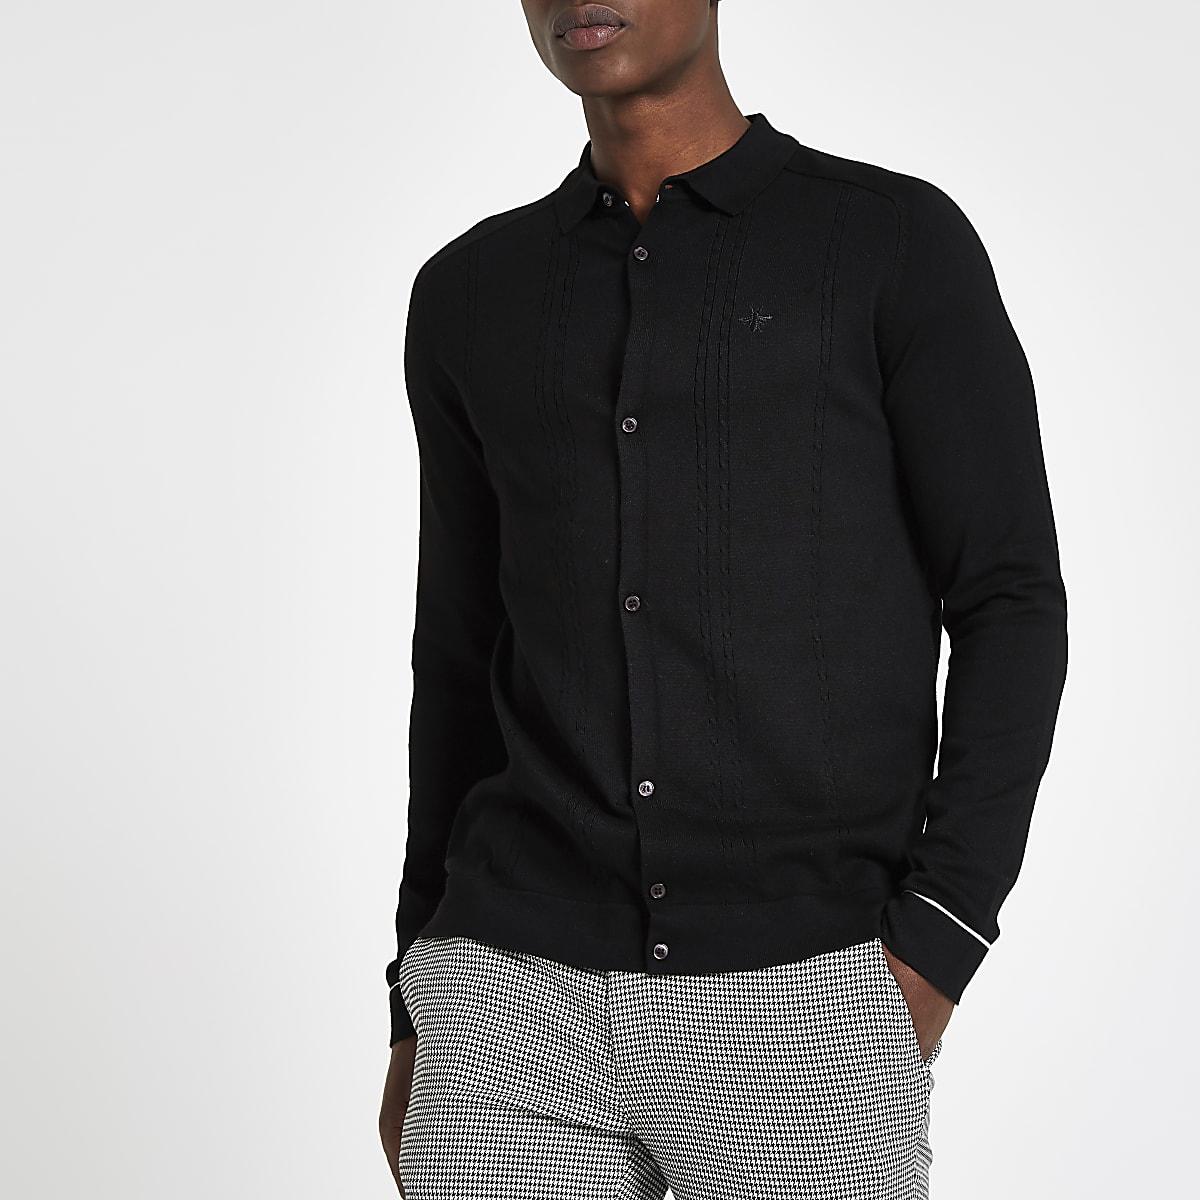 Schwarze, langärmlige Slim Fit Bluse